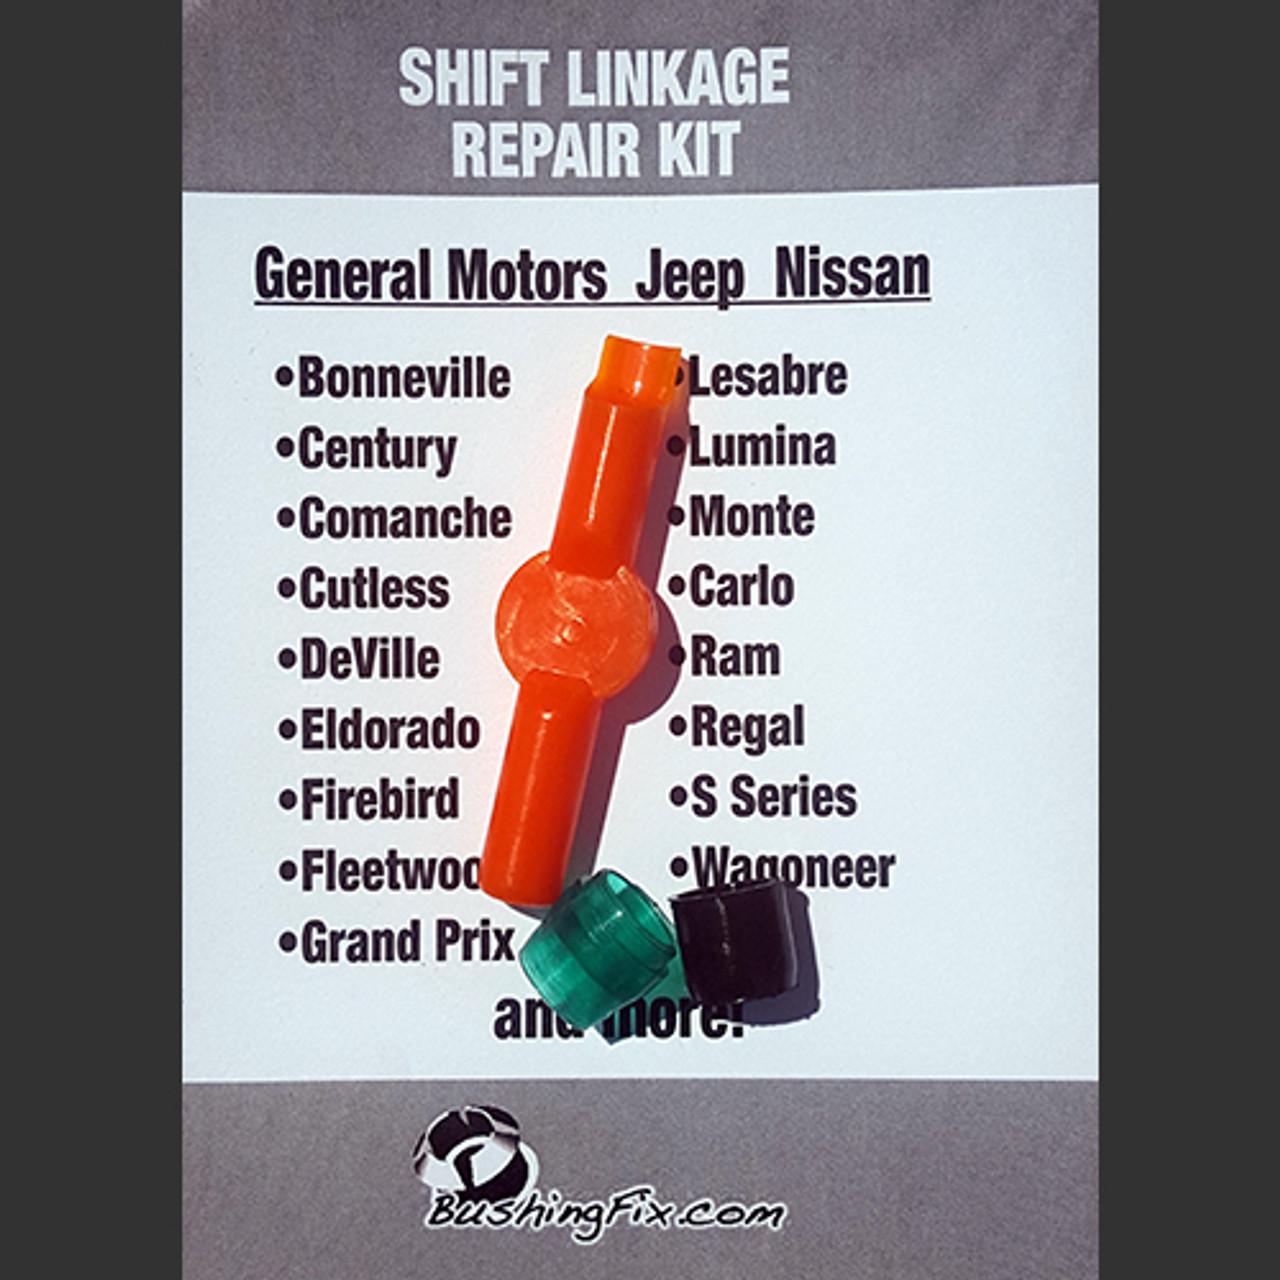 Cadillac Hearse bushing repair kit